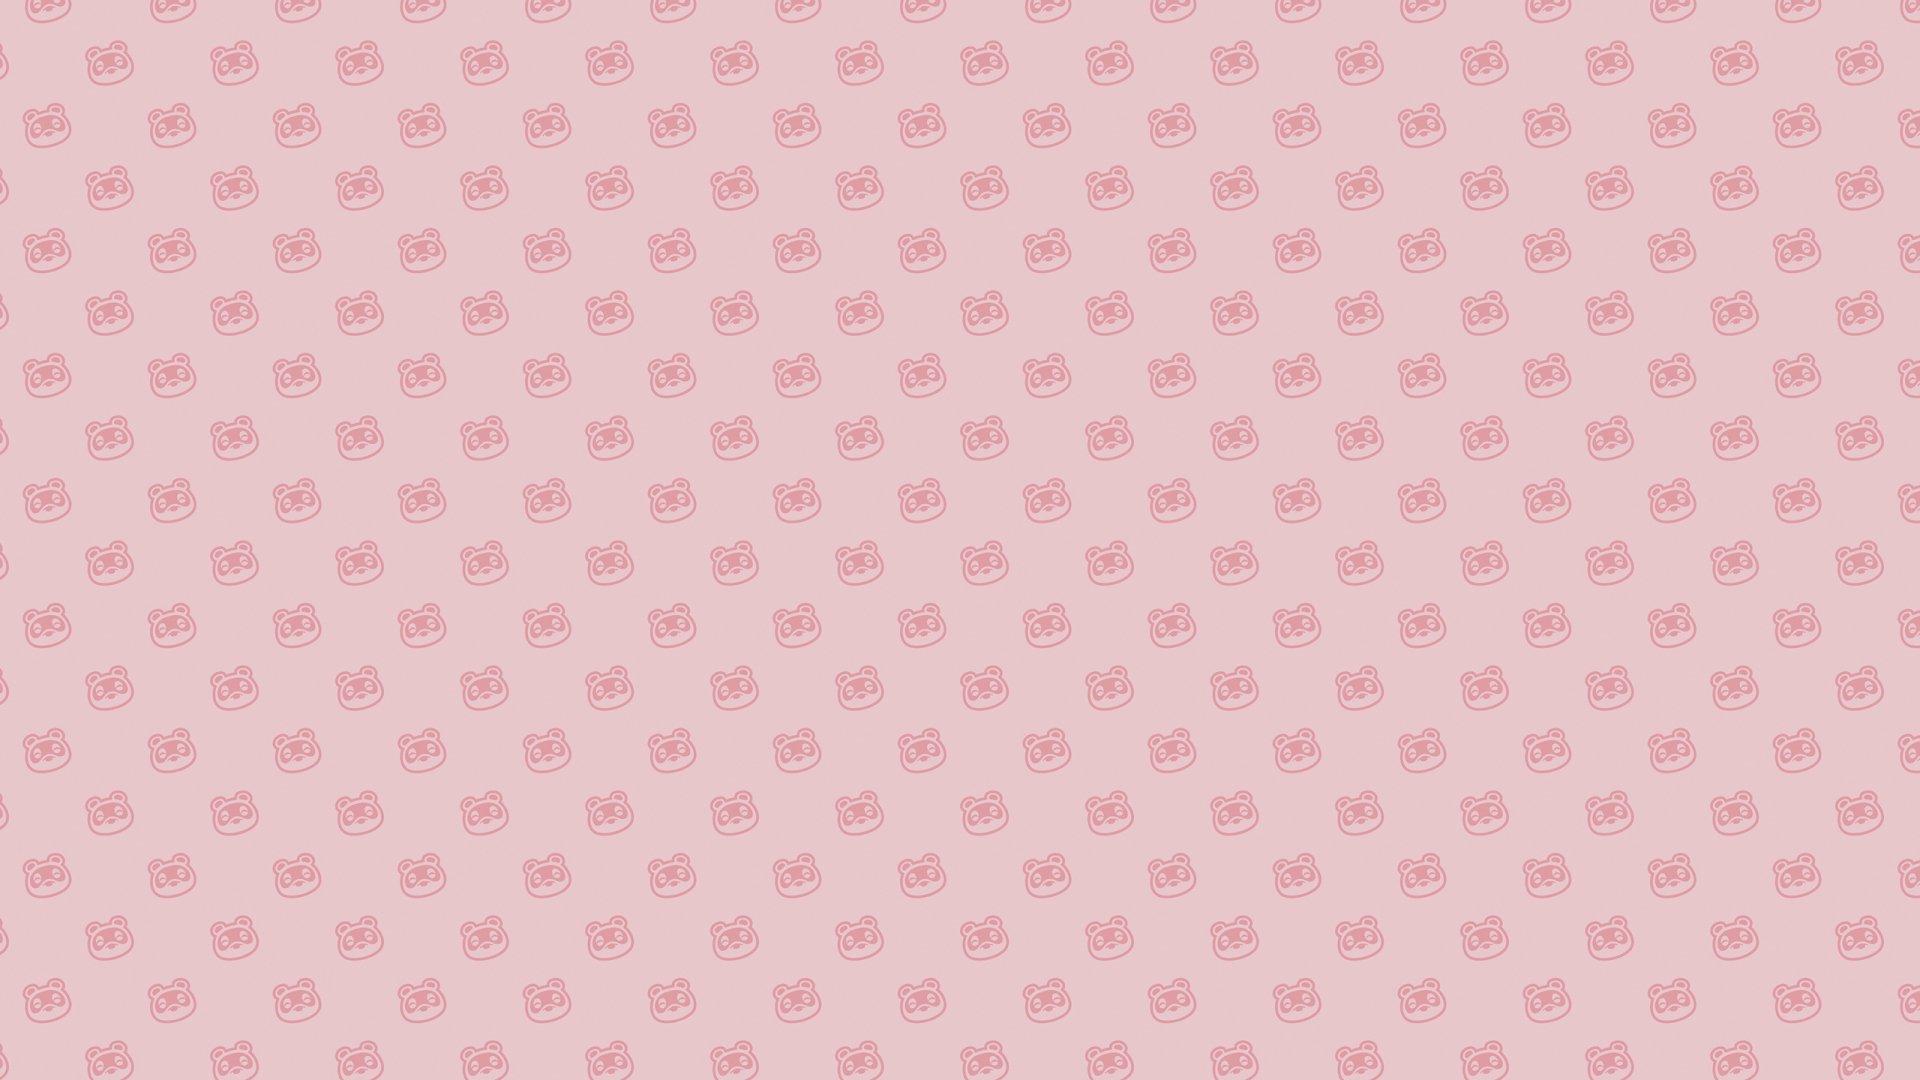 animal crossing wallpaper designs id